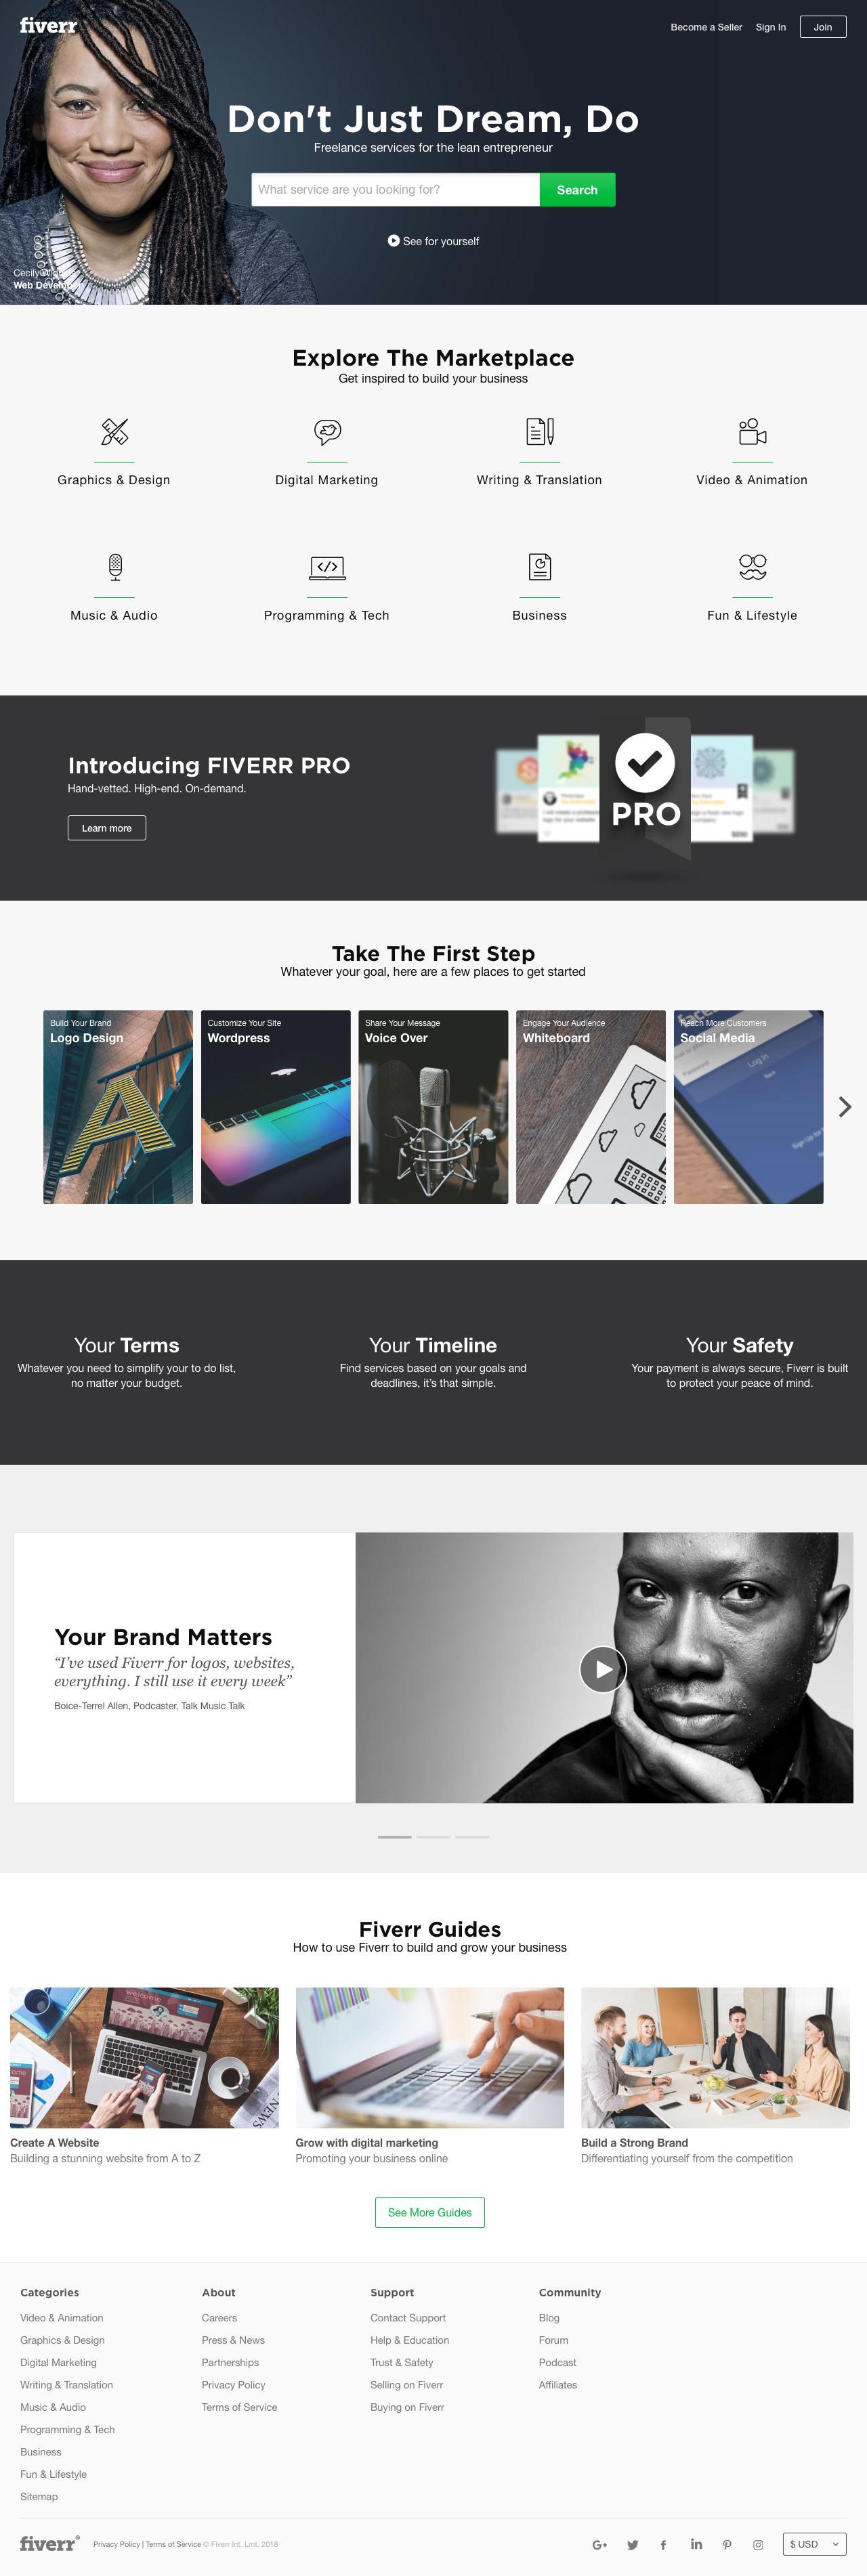 Screenshot of fiverr.com - Fiverr - Freelance Services Marketplace for The Lean Entrepreneur - captured Jan. 12, 2018